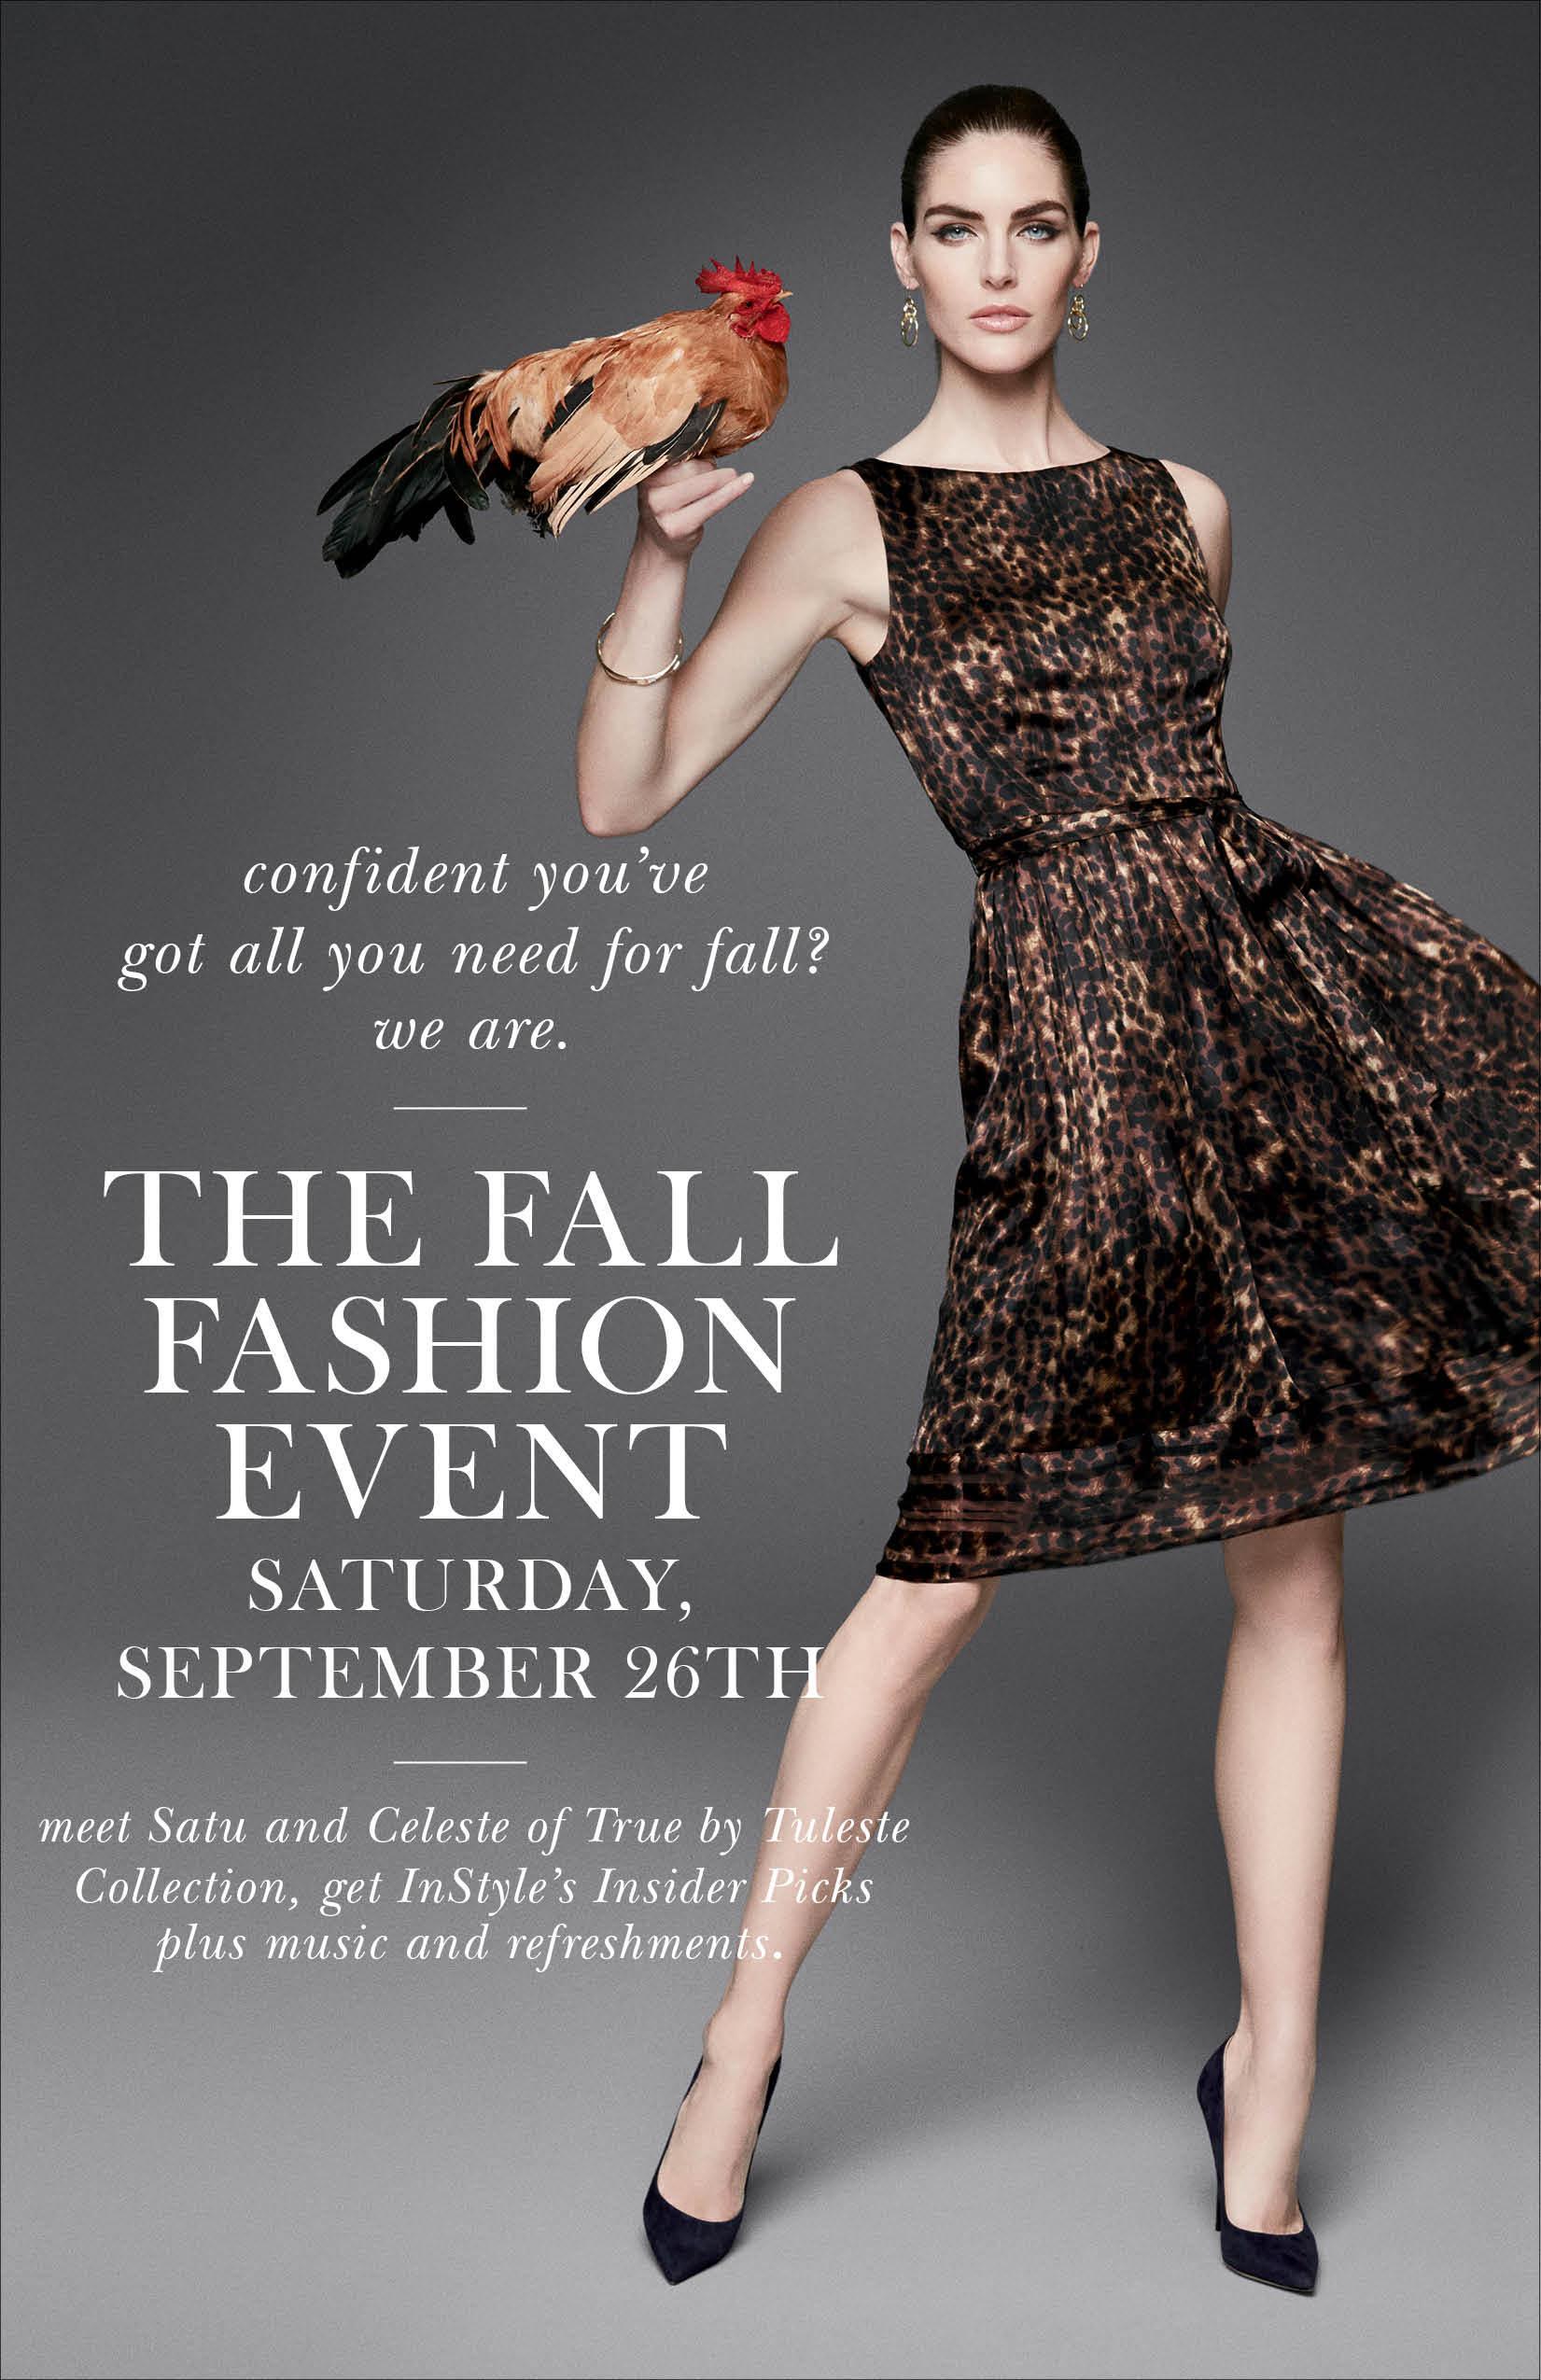 ea0c13e56733556a81e7_dress_barn_event.jpg